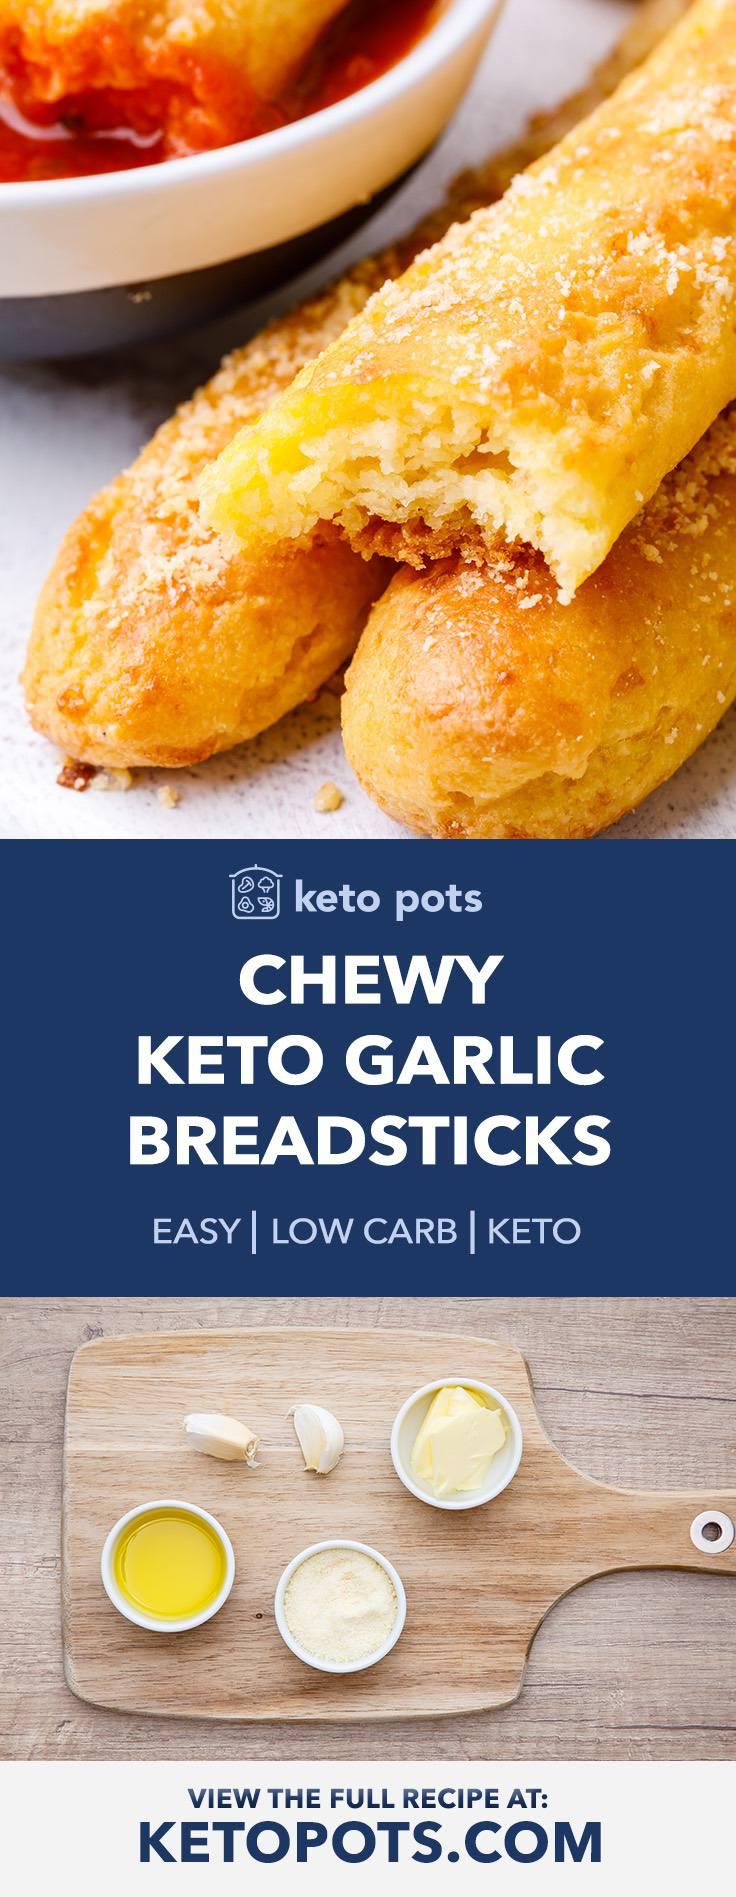 Chewy Keto Garlic Breadsticks